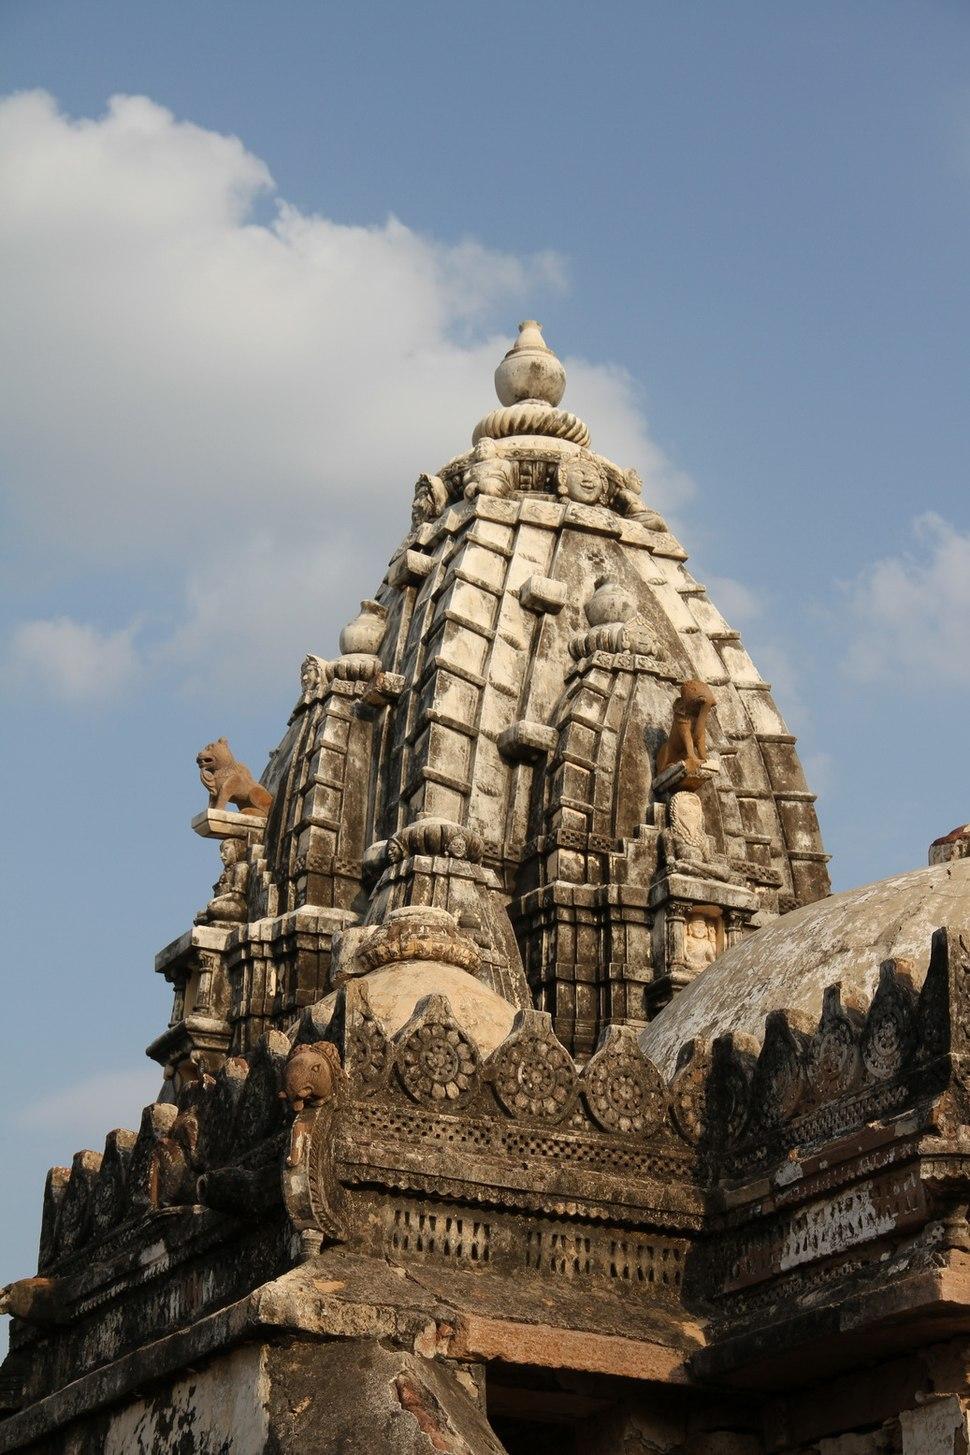 Jain Temple Nagarparkar by smn121-16